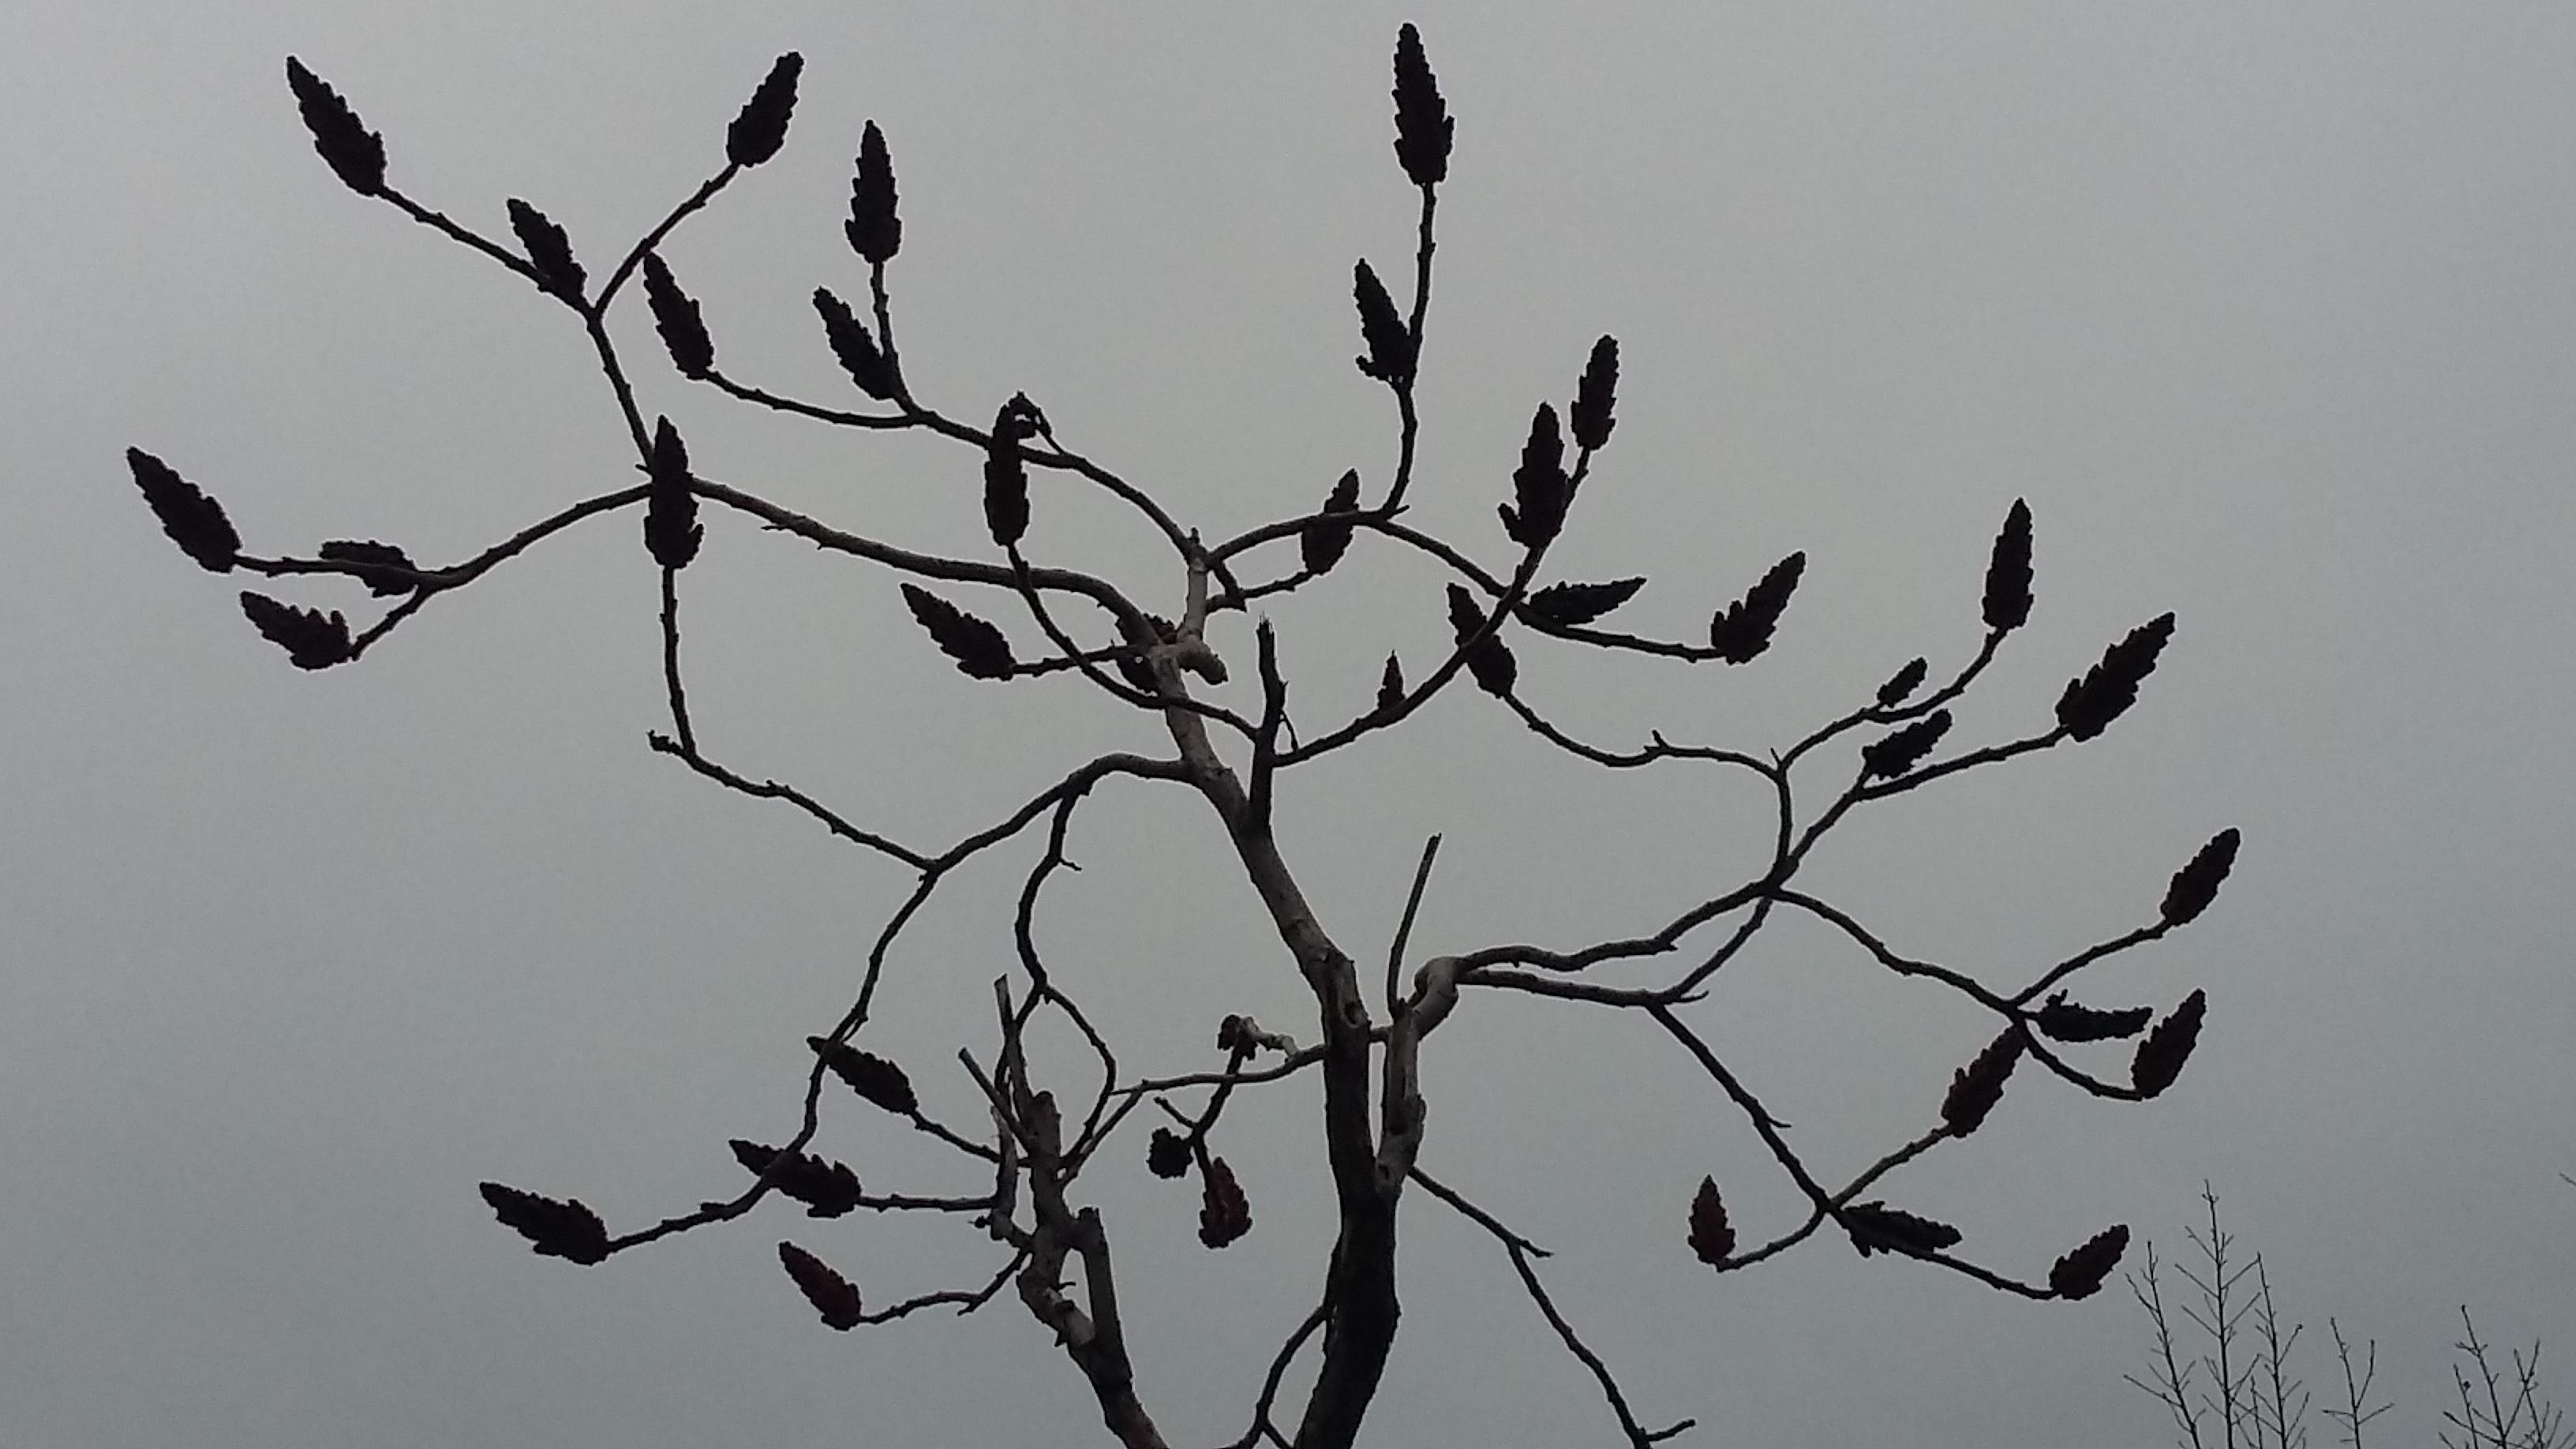 Gambar Pohon Alam Cabang Daun Bunga Garis Ranting Seni